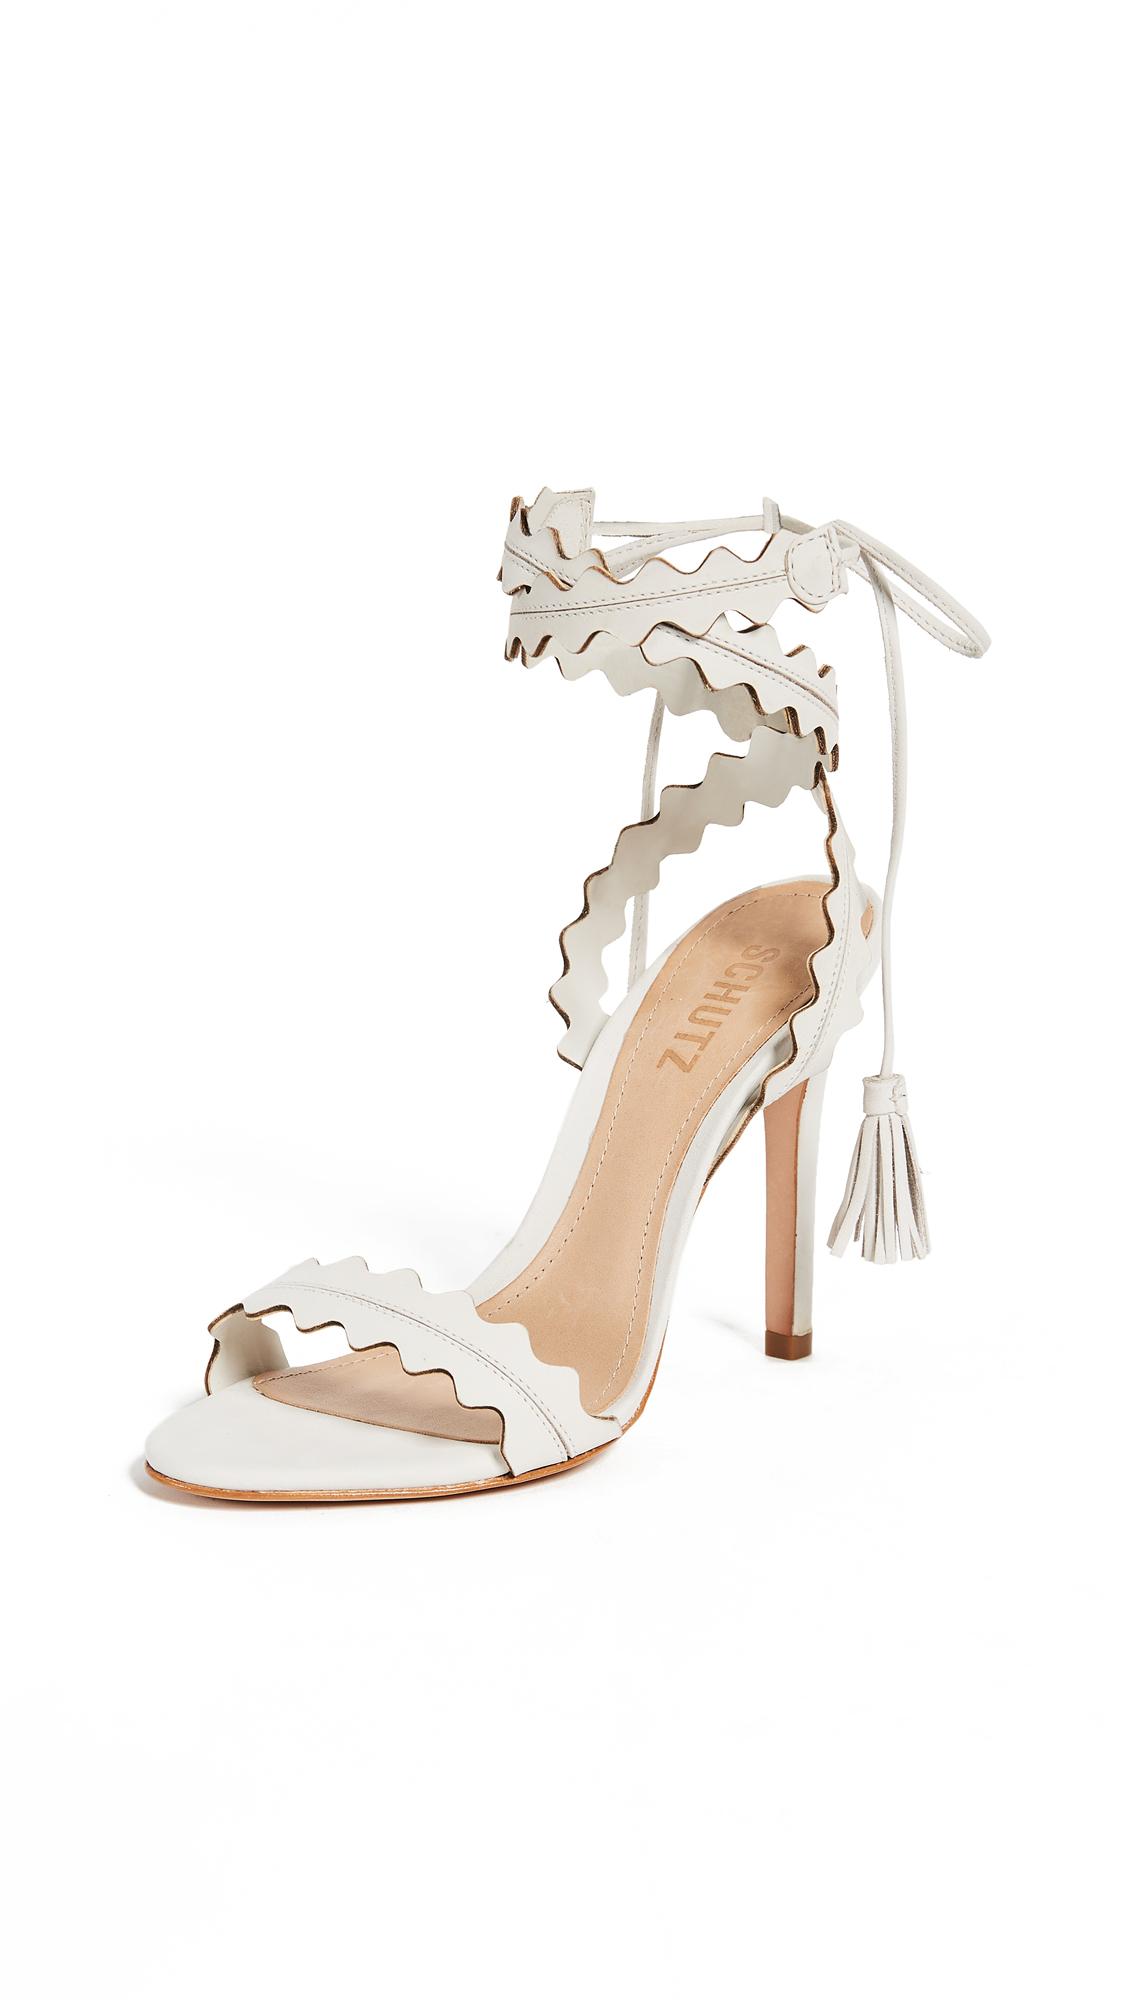 Schutz Lisana Wrap Sandals - Pearl